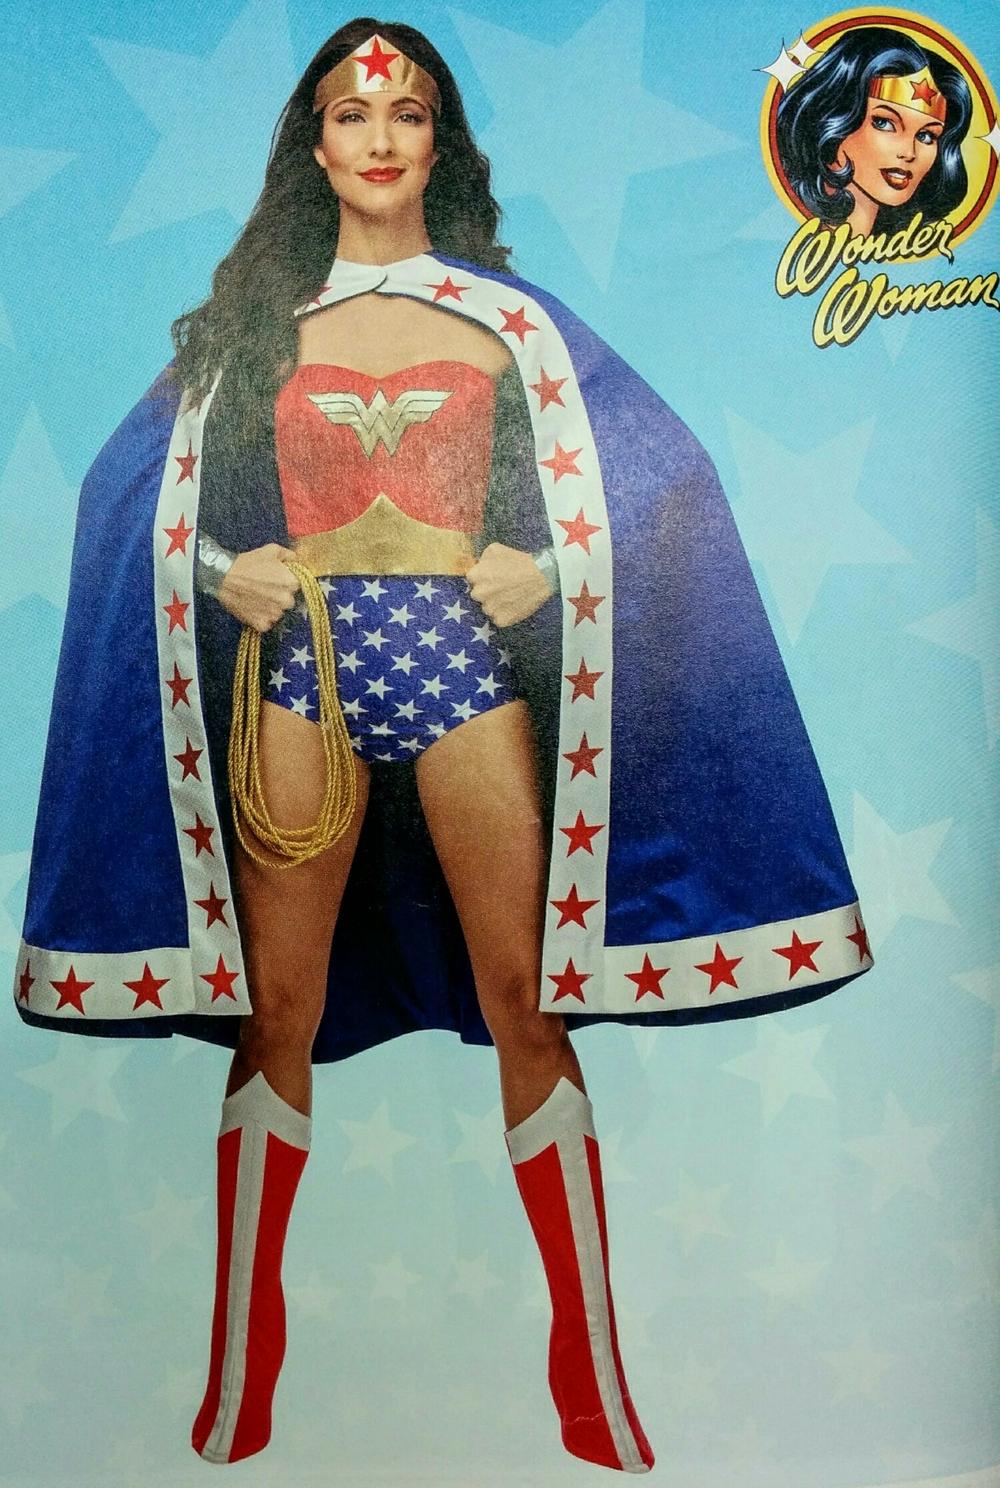 Wonderful Wonder Woman image from Simplicity.com